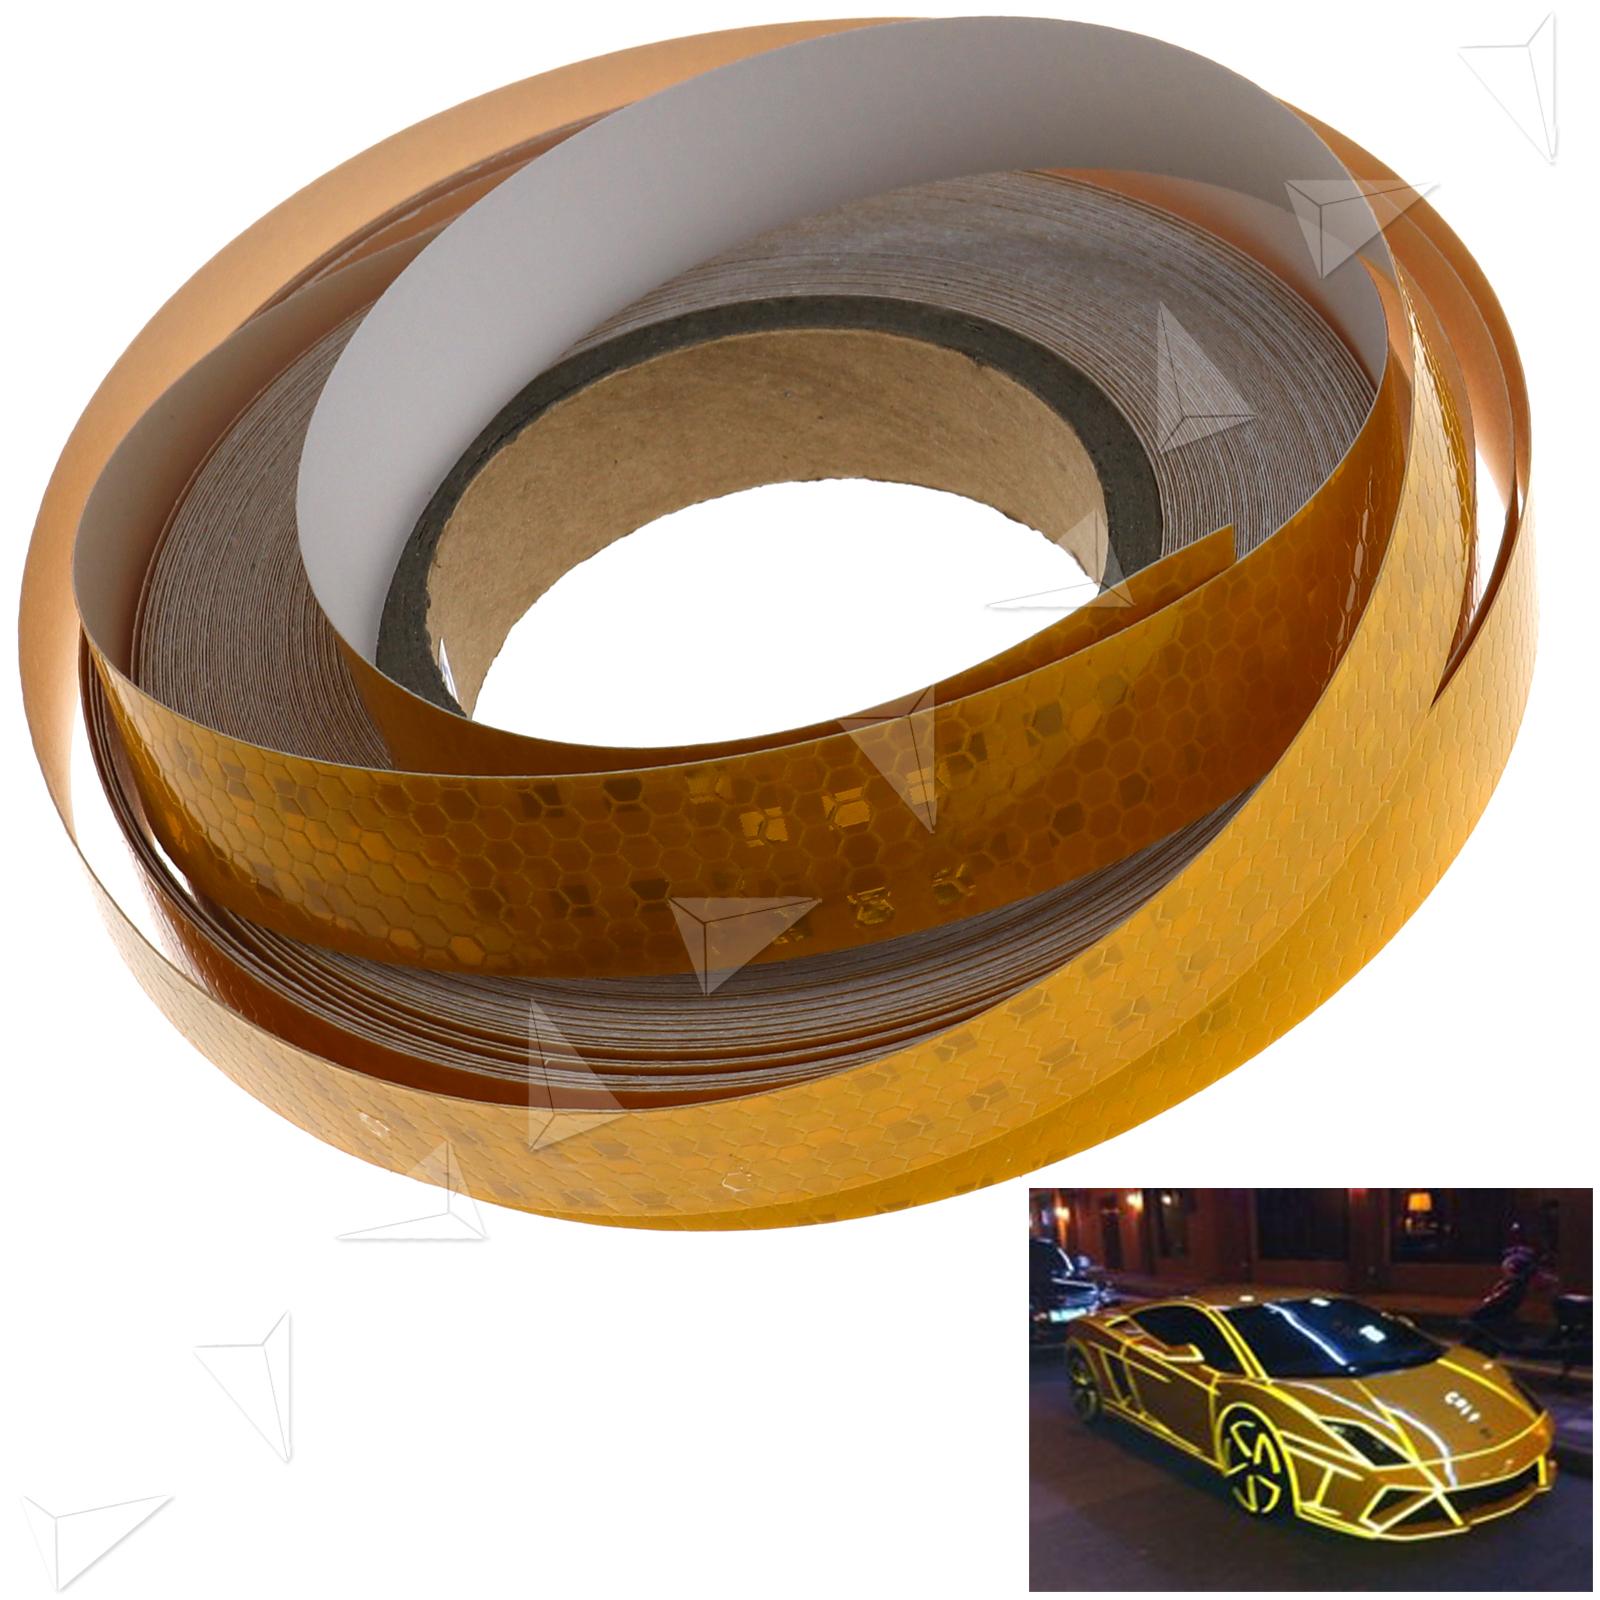 Self-Adhesive Reflective Indicator Warning Conspicuity Tape Yellow 2.5cmx25m